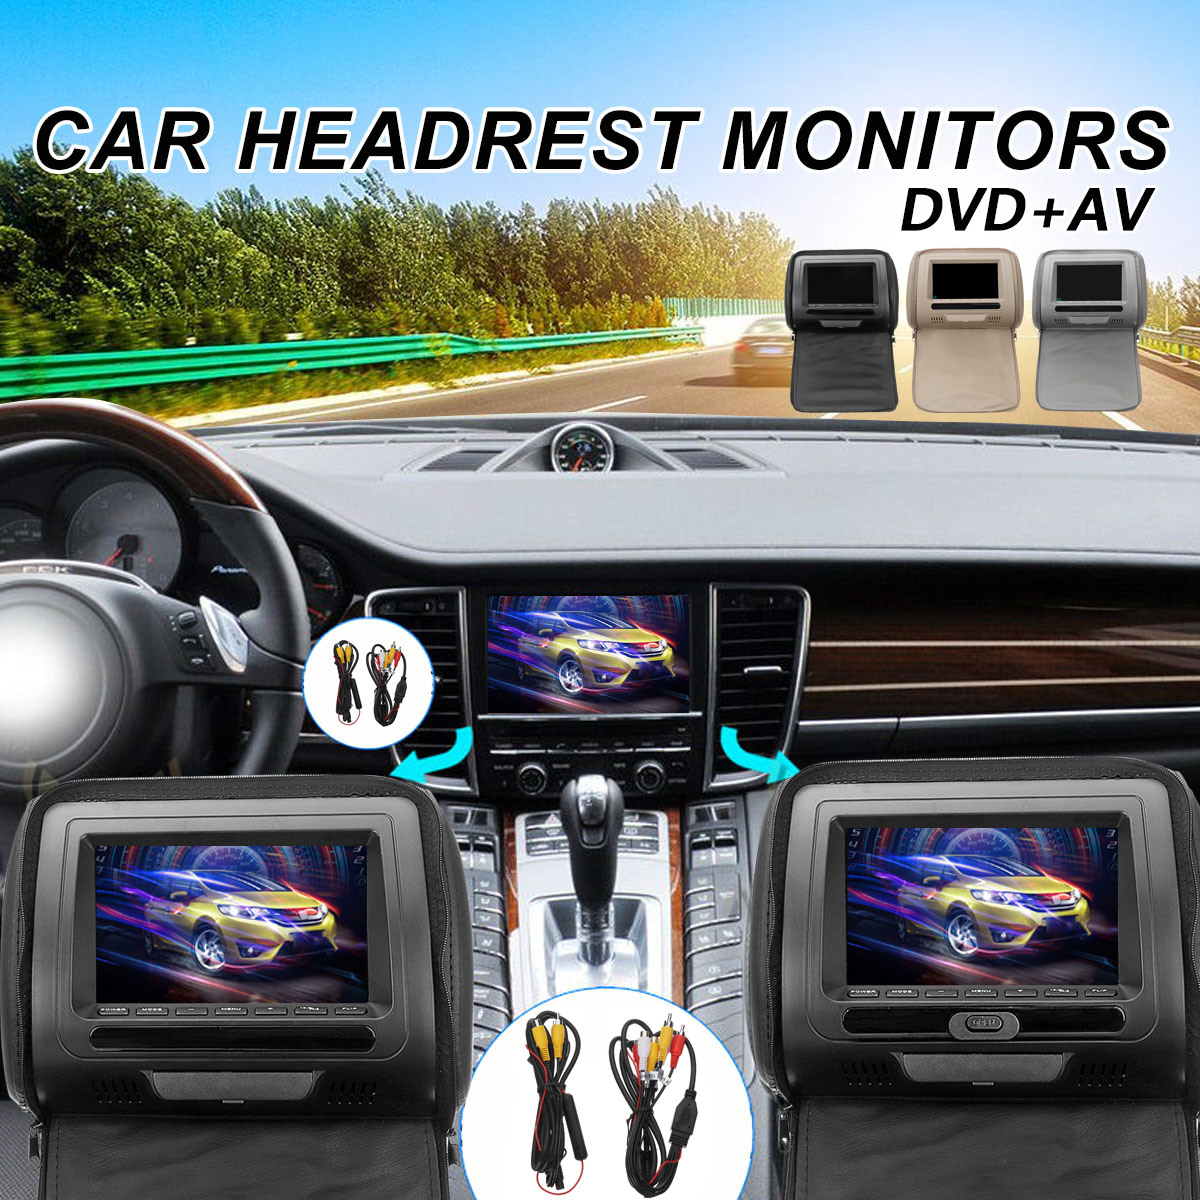 Digital-Screen Pillow Monitor Dvd-Headrest Av-Player Remote-Control 7inch Wireless Car